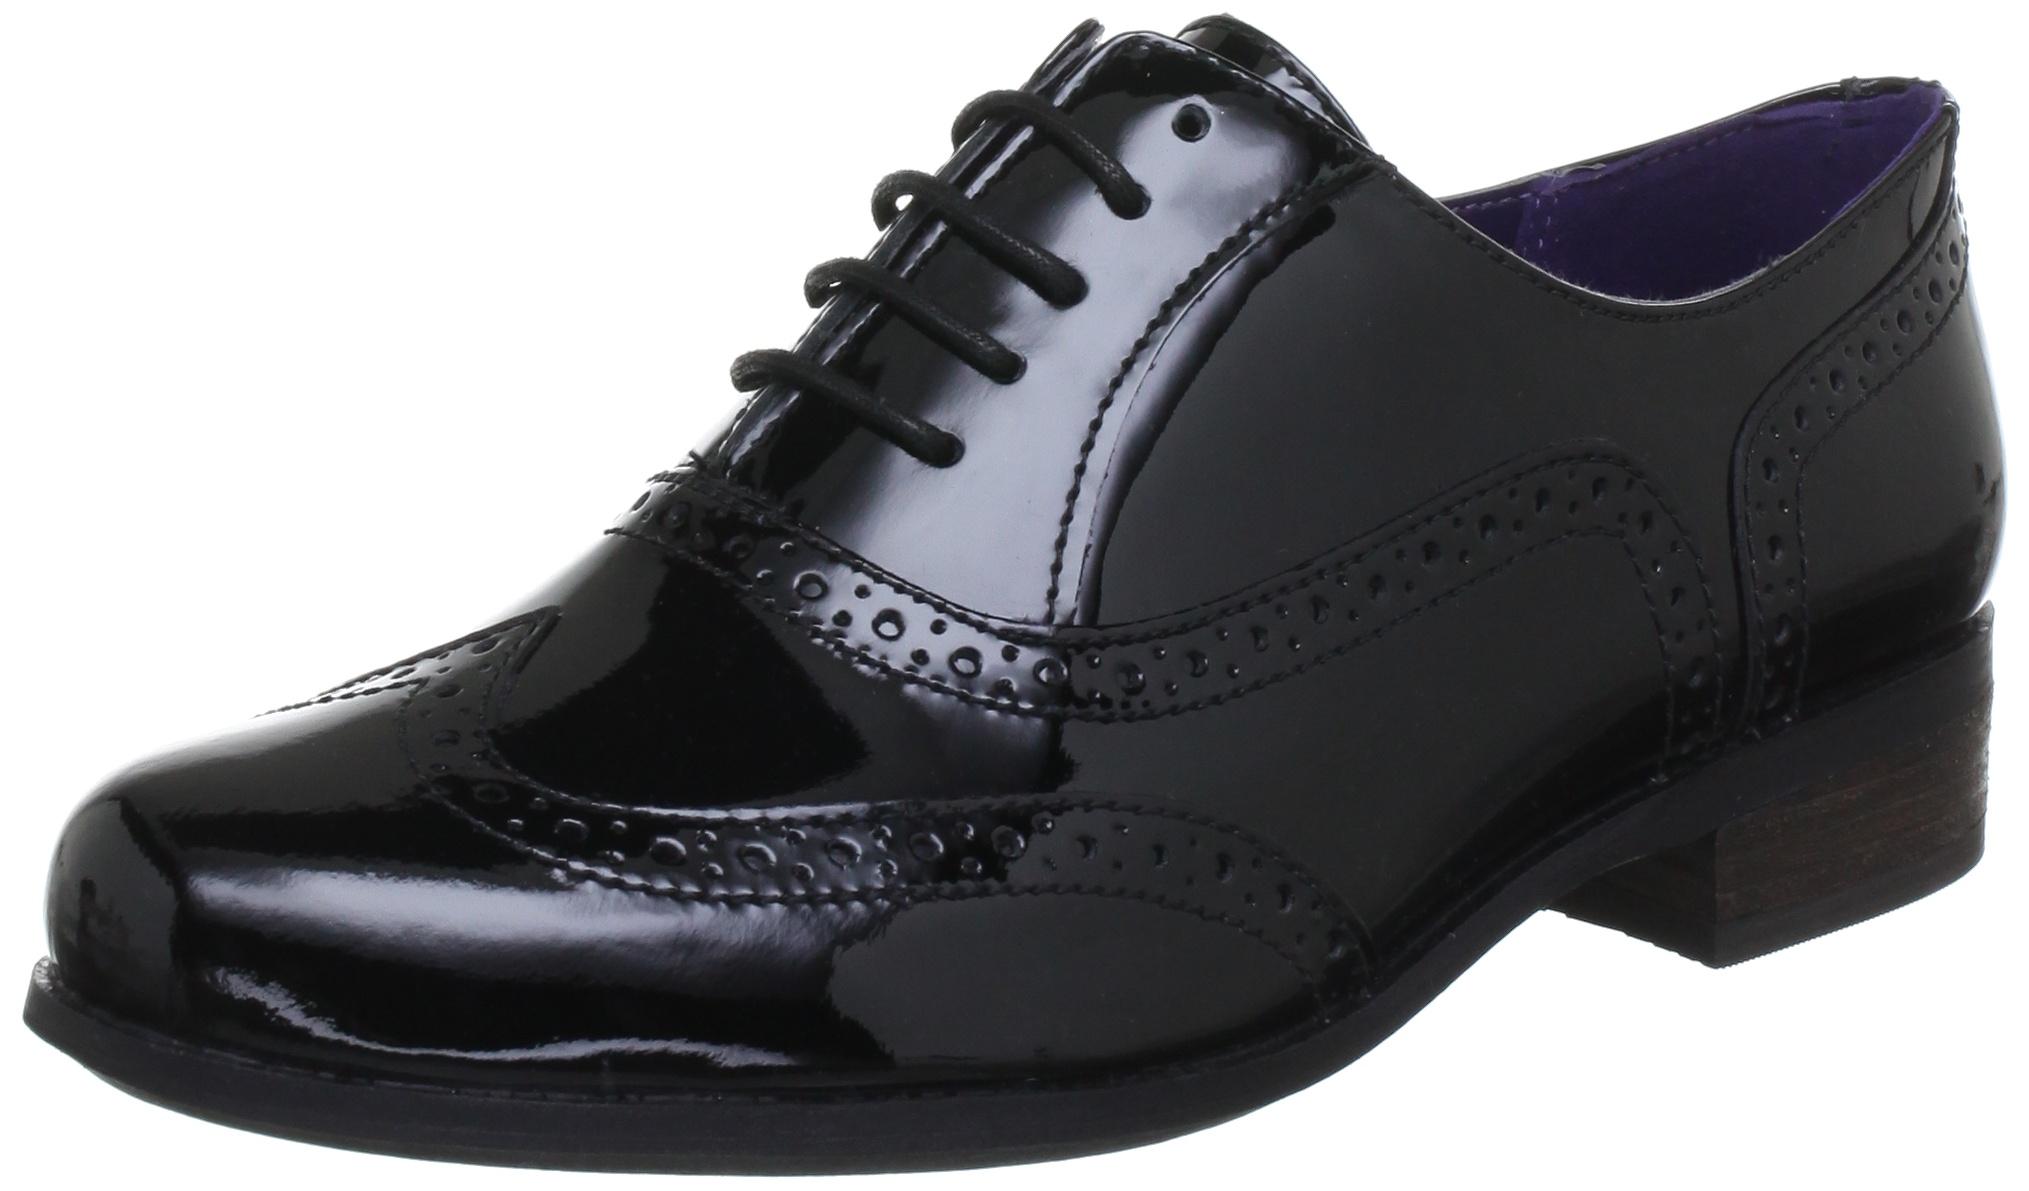 Clarks Hambleオークの女性の靴